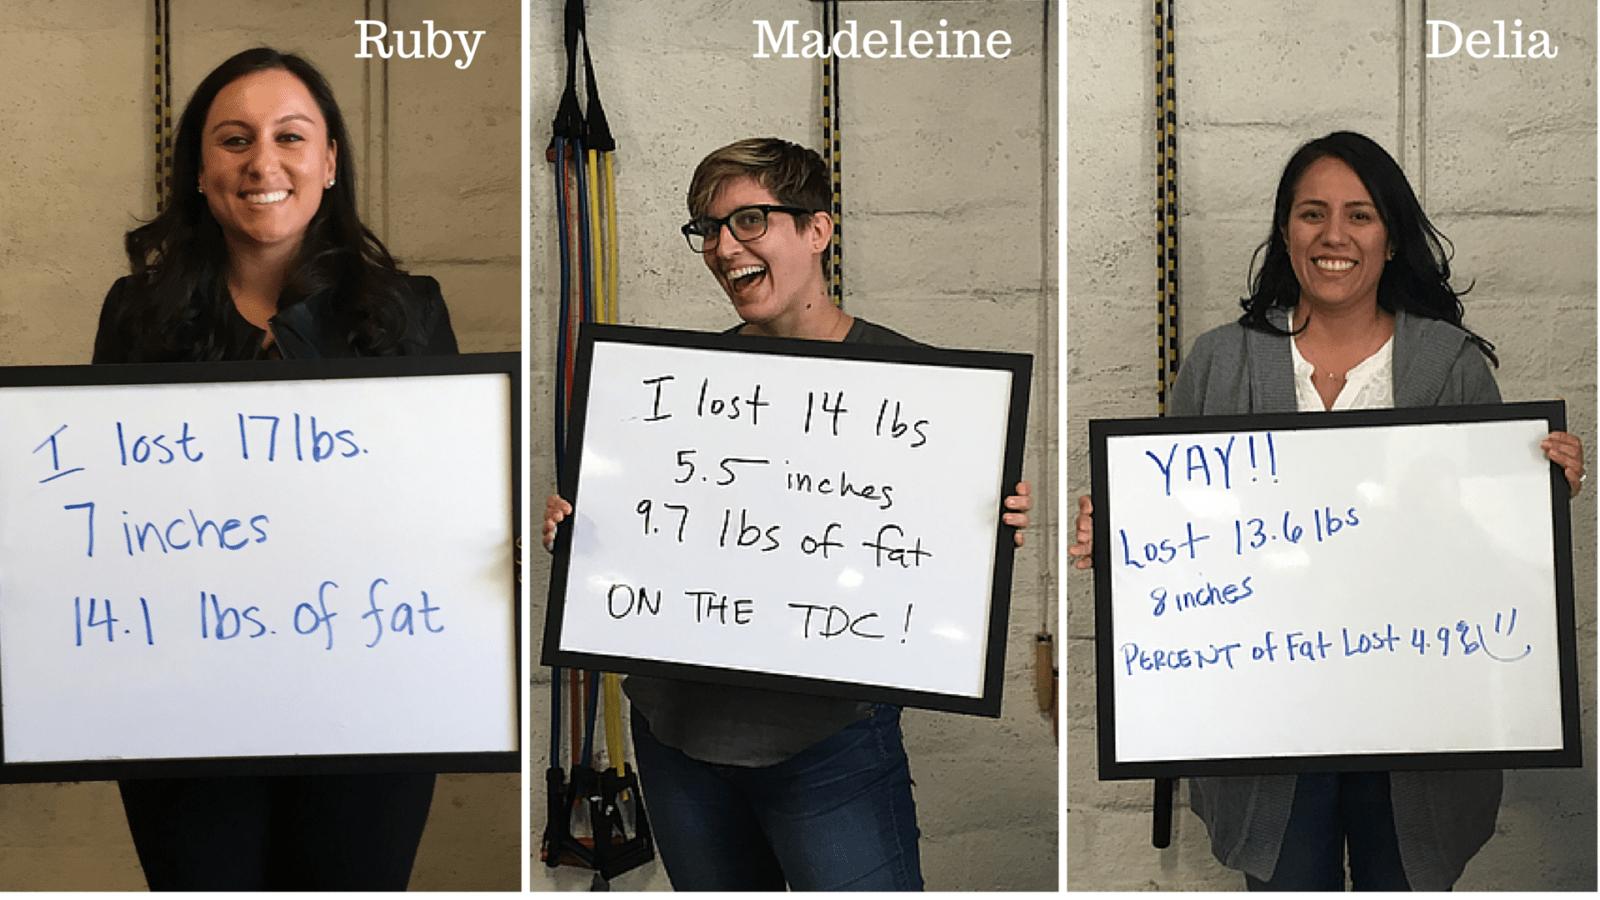 TDC Tryptich (Ruby, Madeleine, Delia)